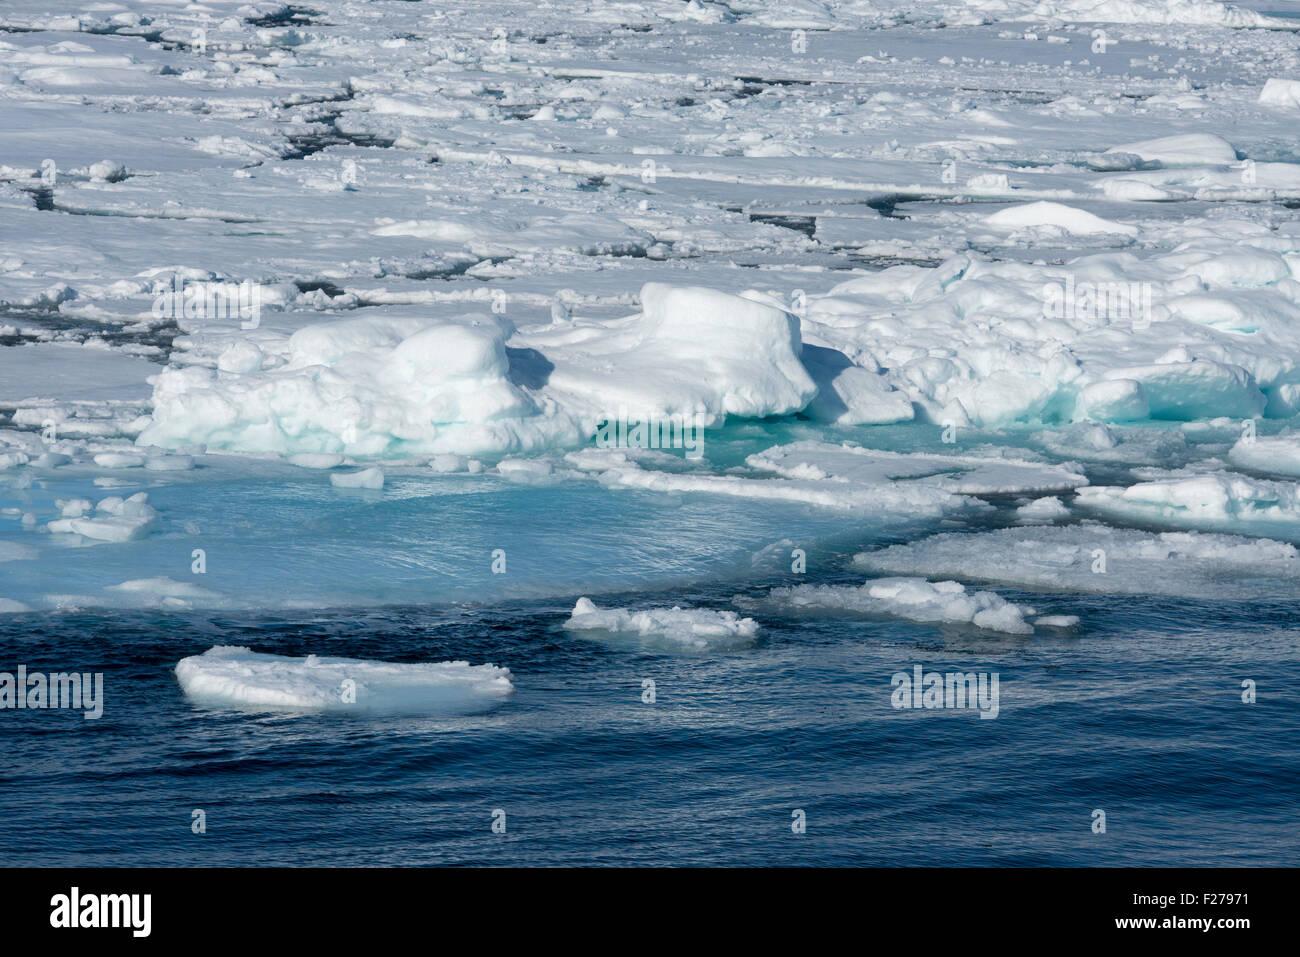 Norway, Barents Sea, Svalbard, Nordaustlandet. Ice flow along the Nordaust-Svalbard Nature Reserve. - Stock Image